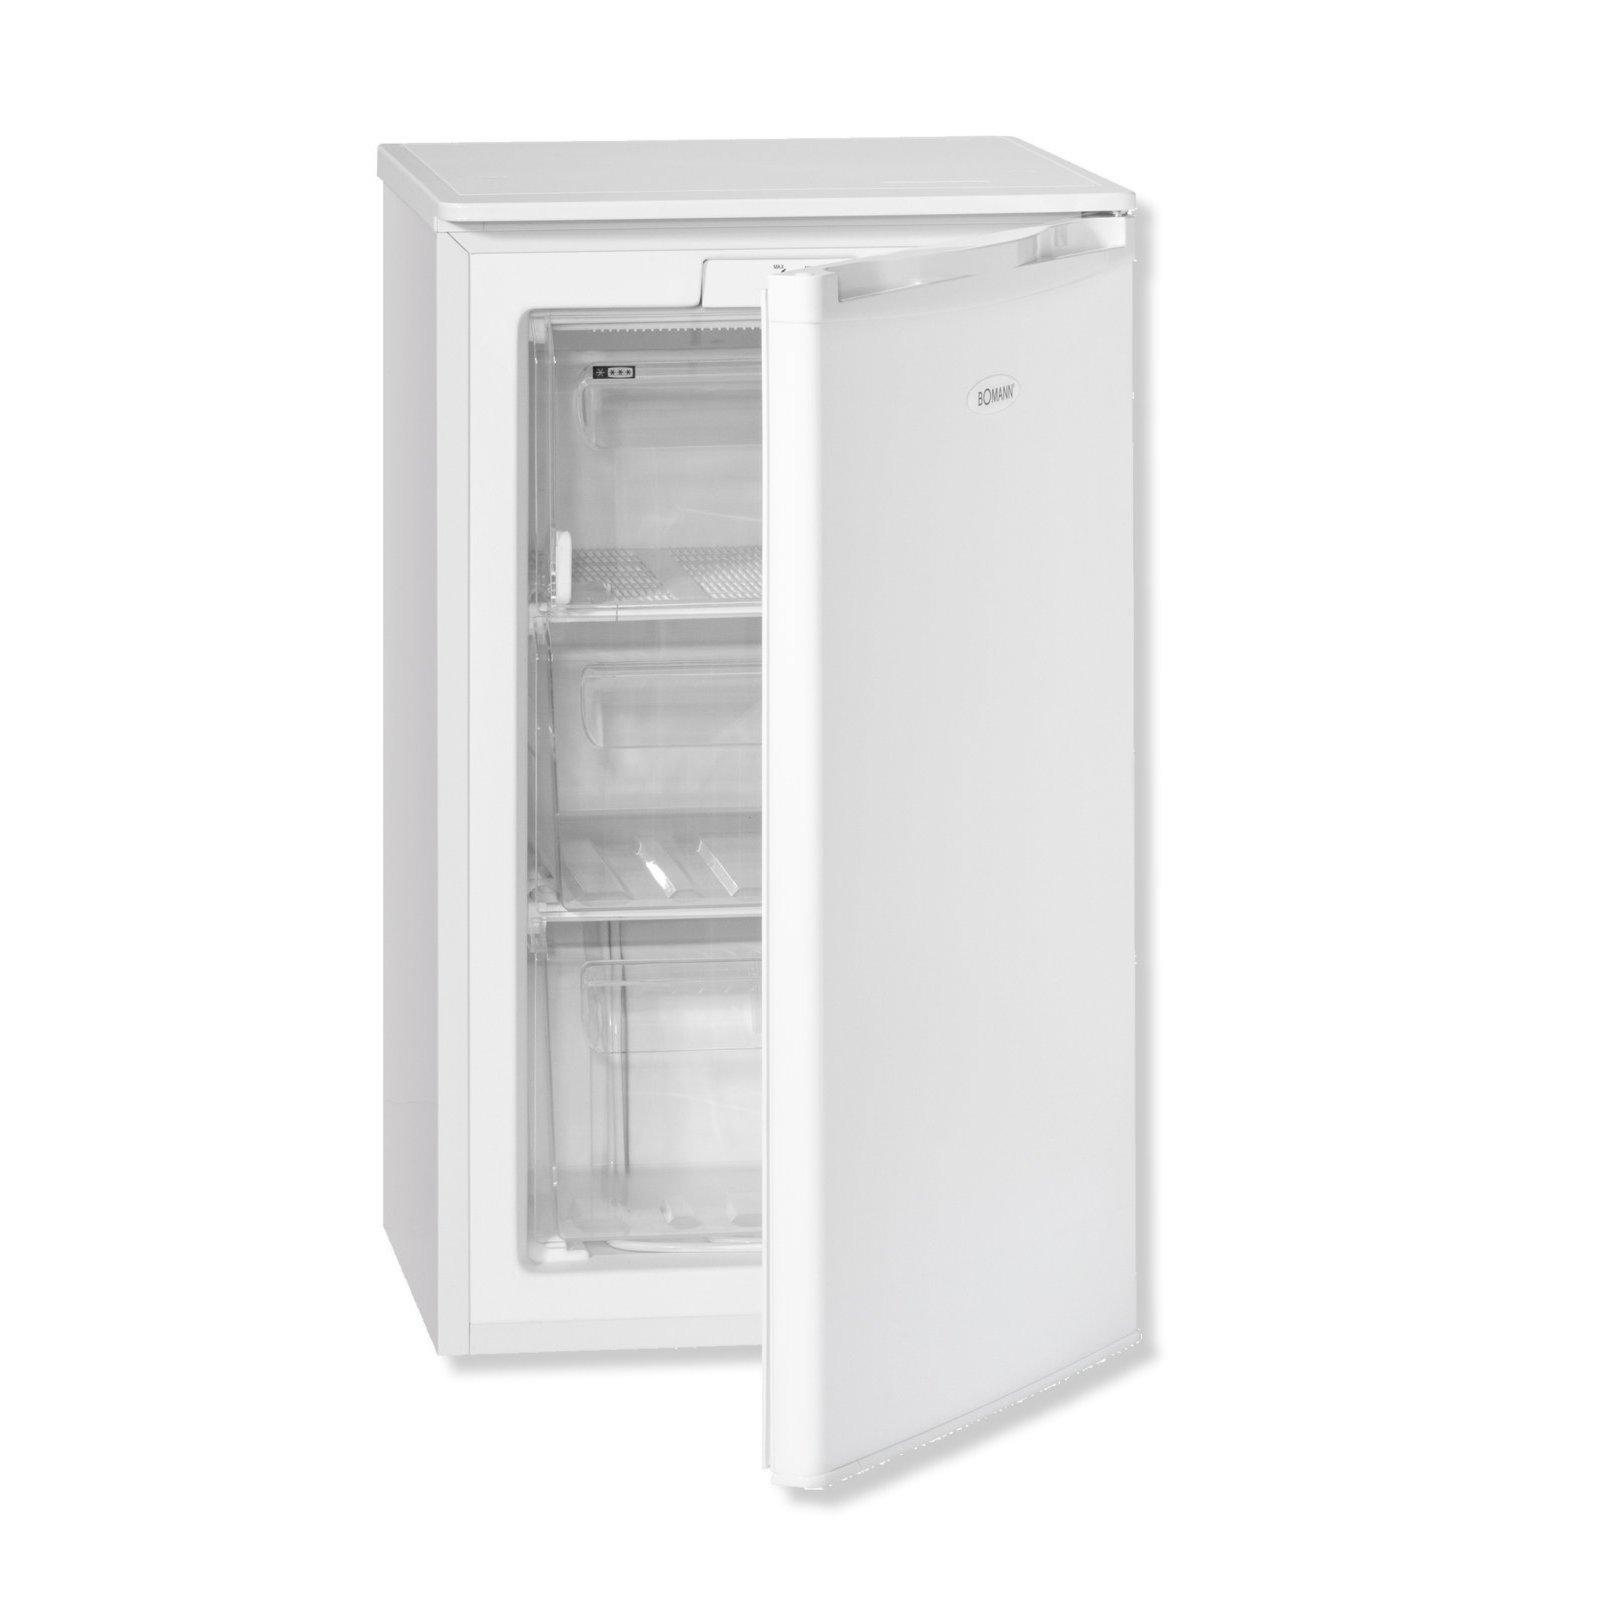 bomann gefrierschrank gs 165 1 a k hl. Black Bedroom Furniture Sets. Home Design Ideas